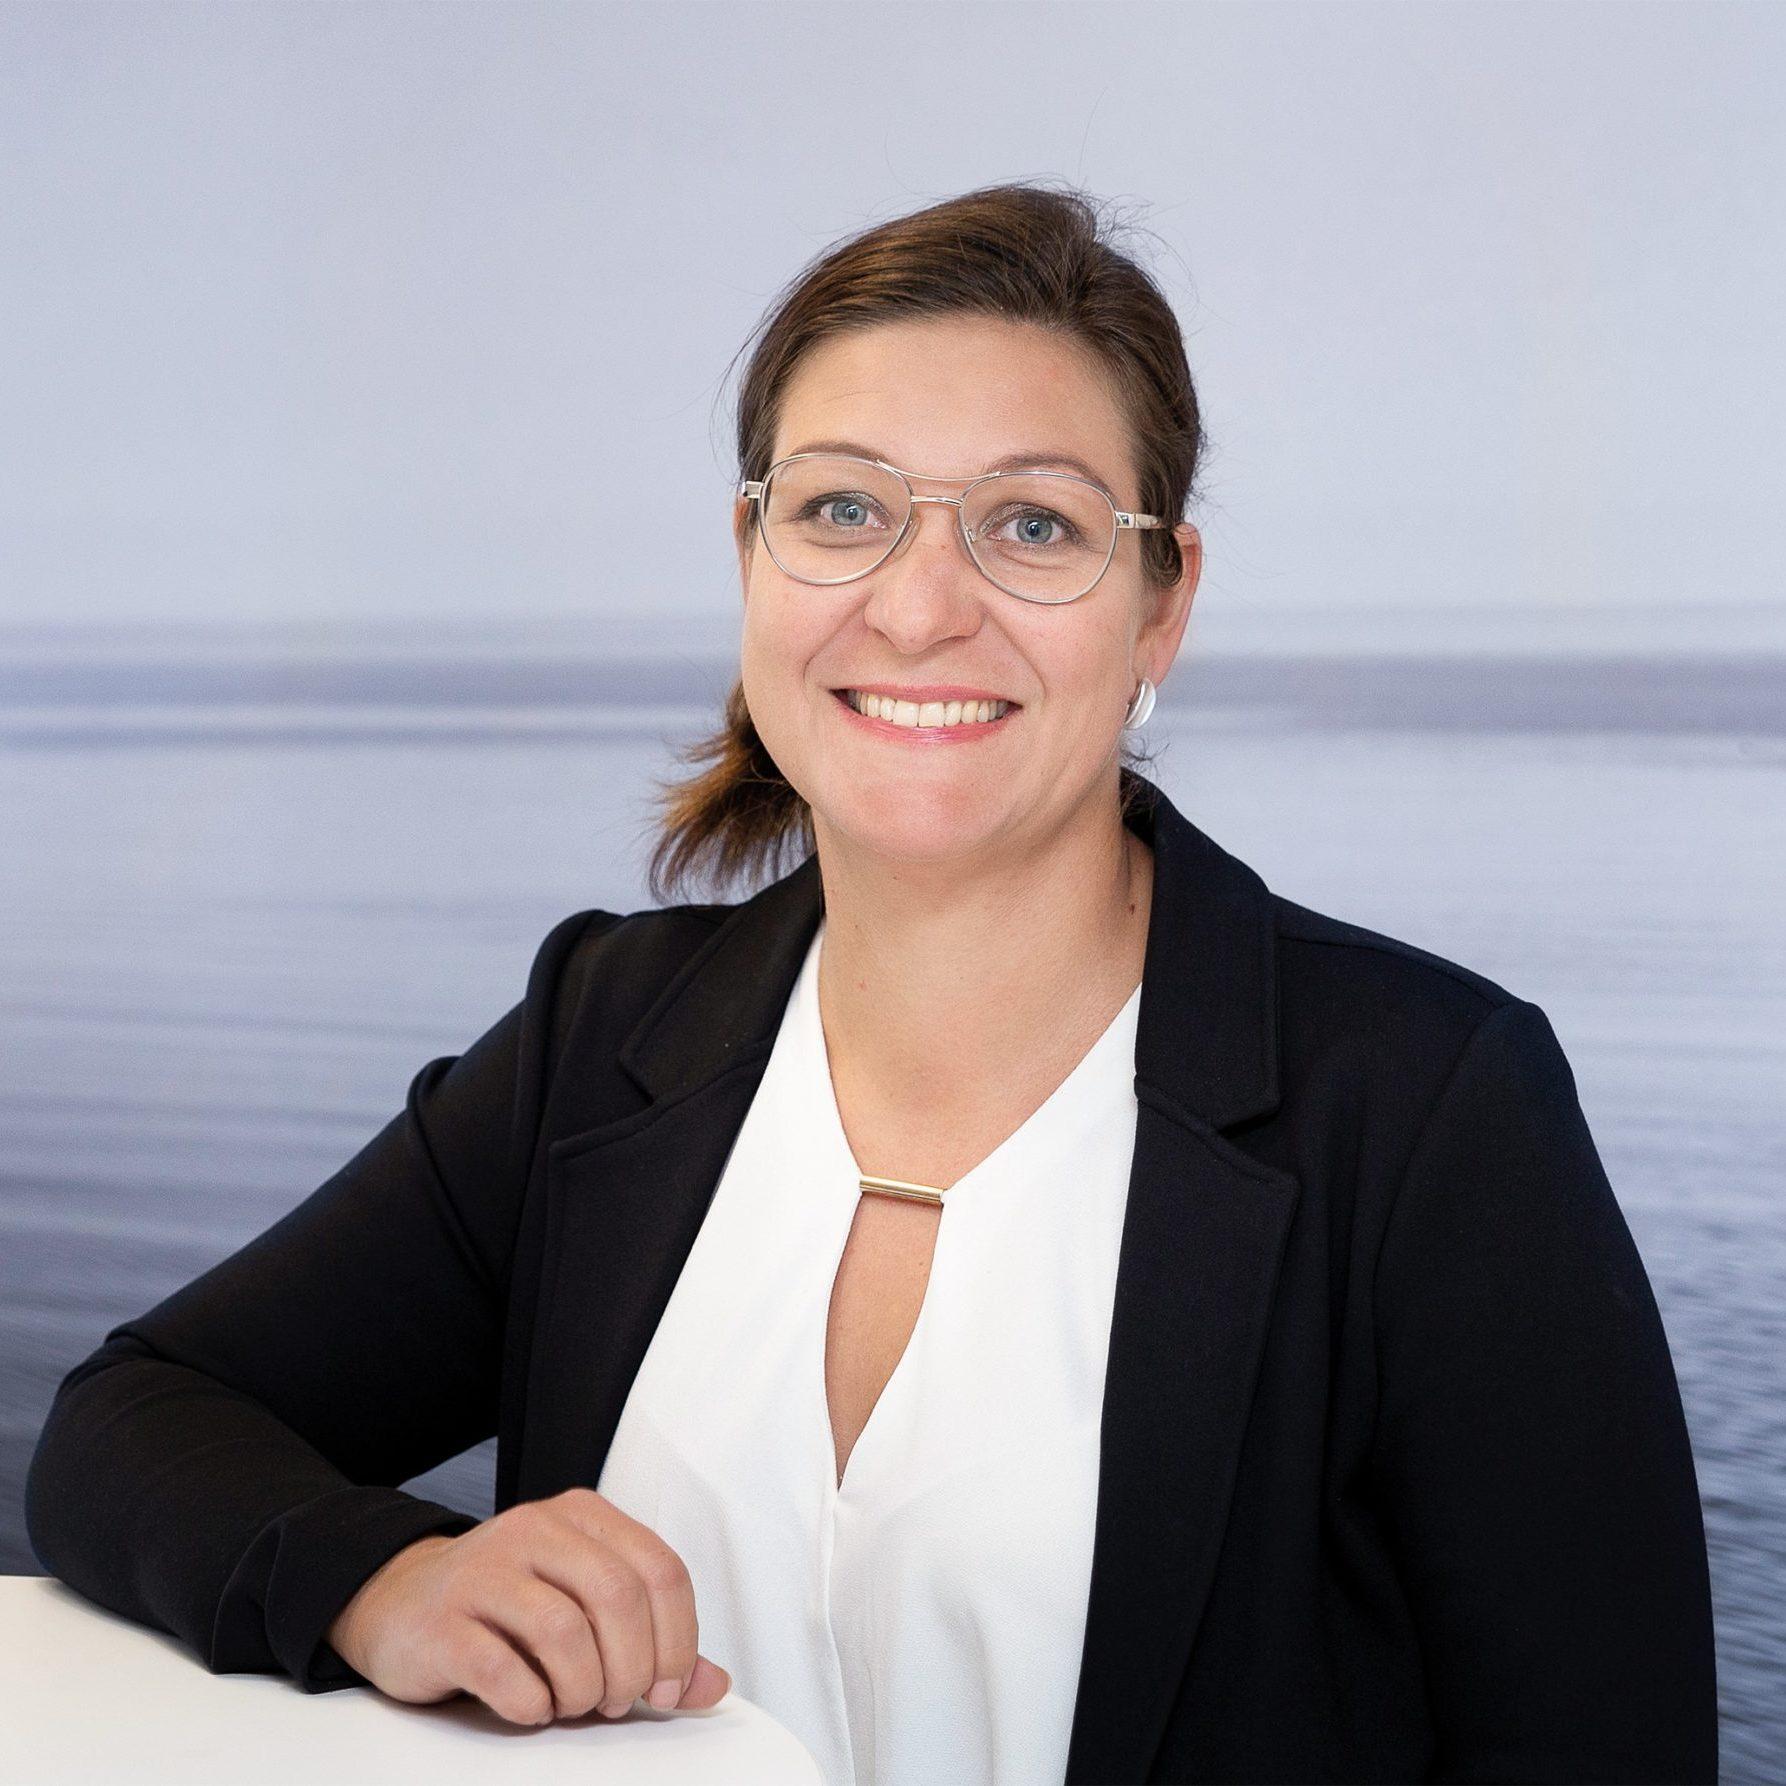 Miia Hietanen